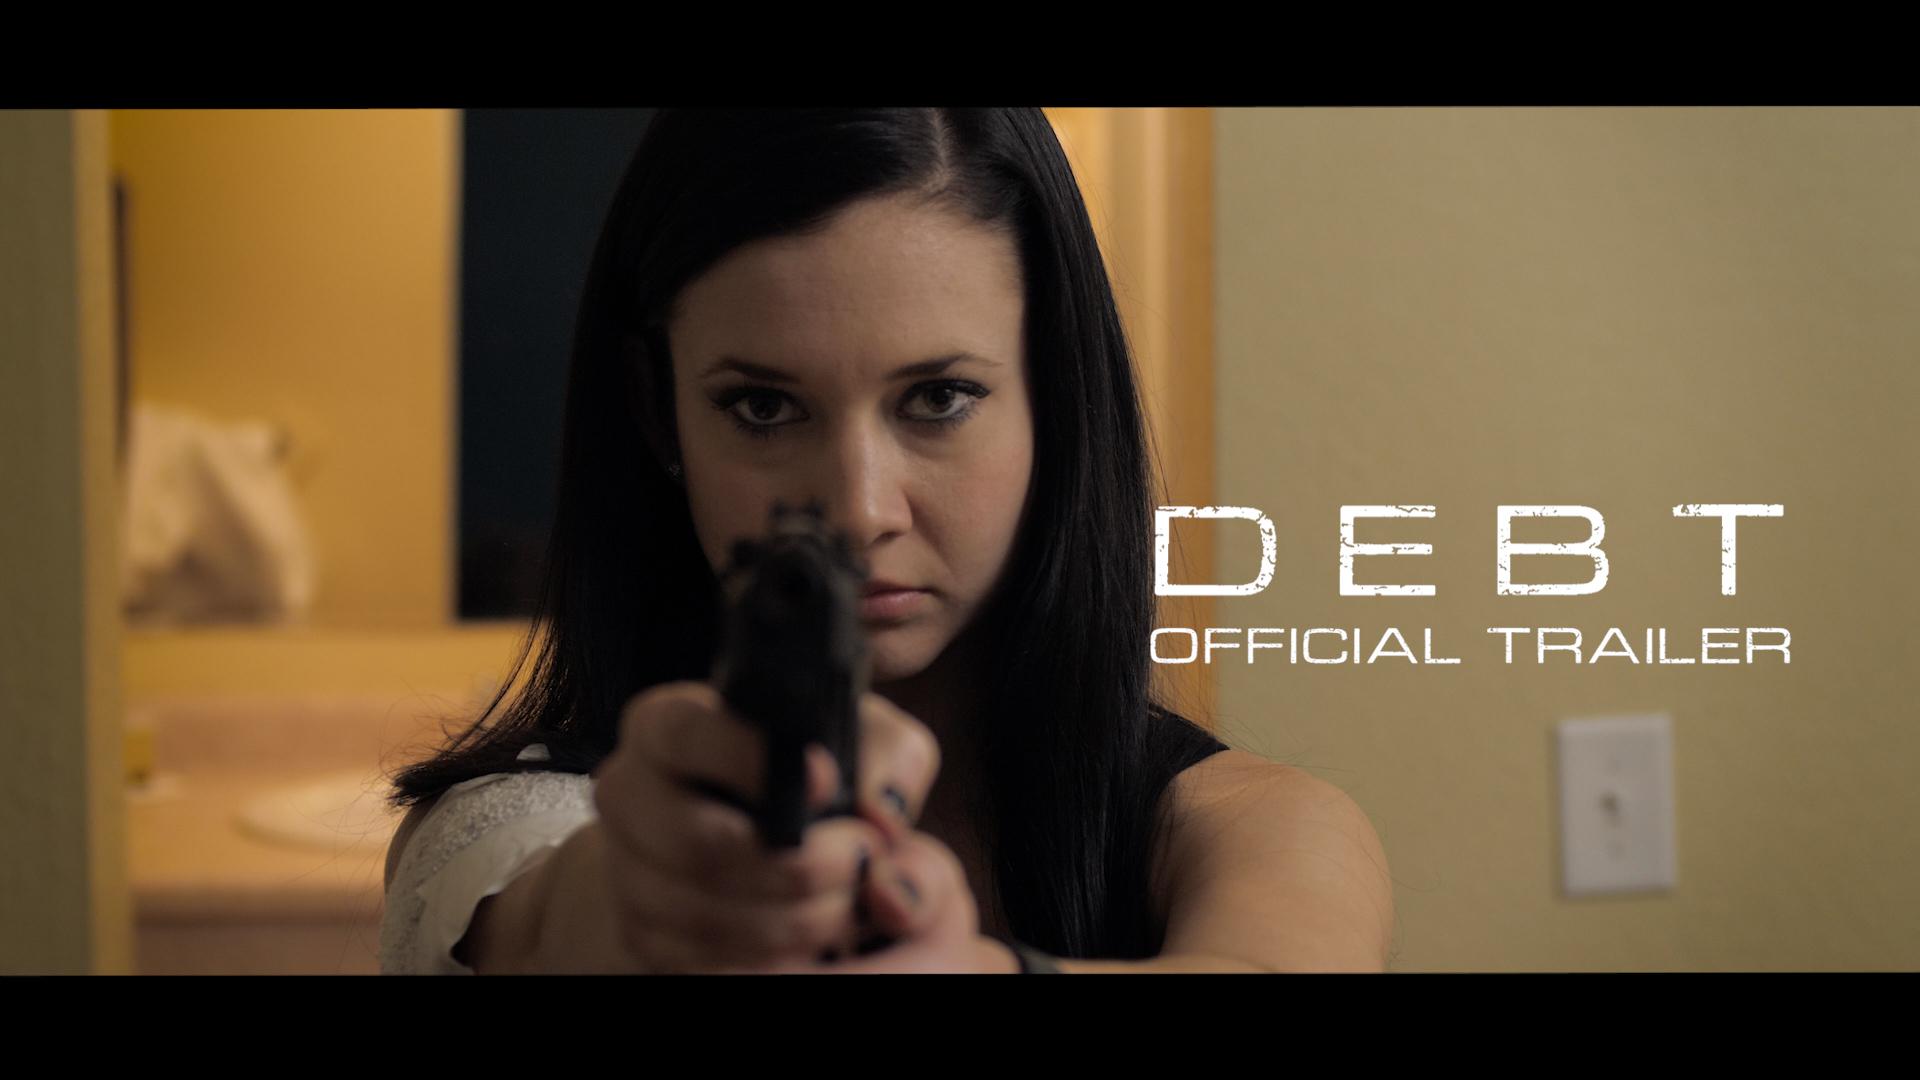 Newsletter #14: The DEBT Trailer is here